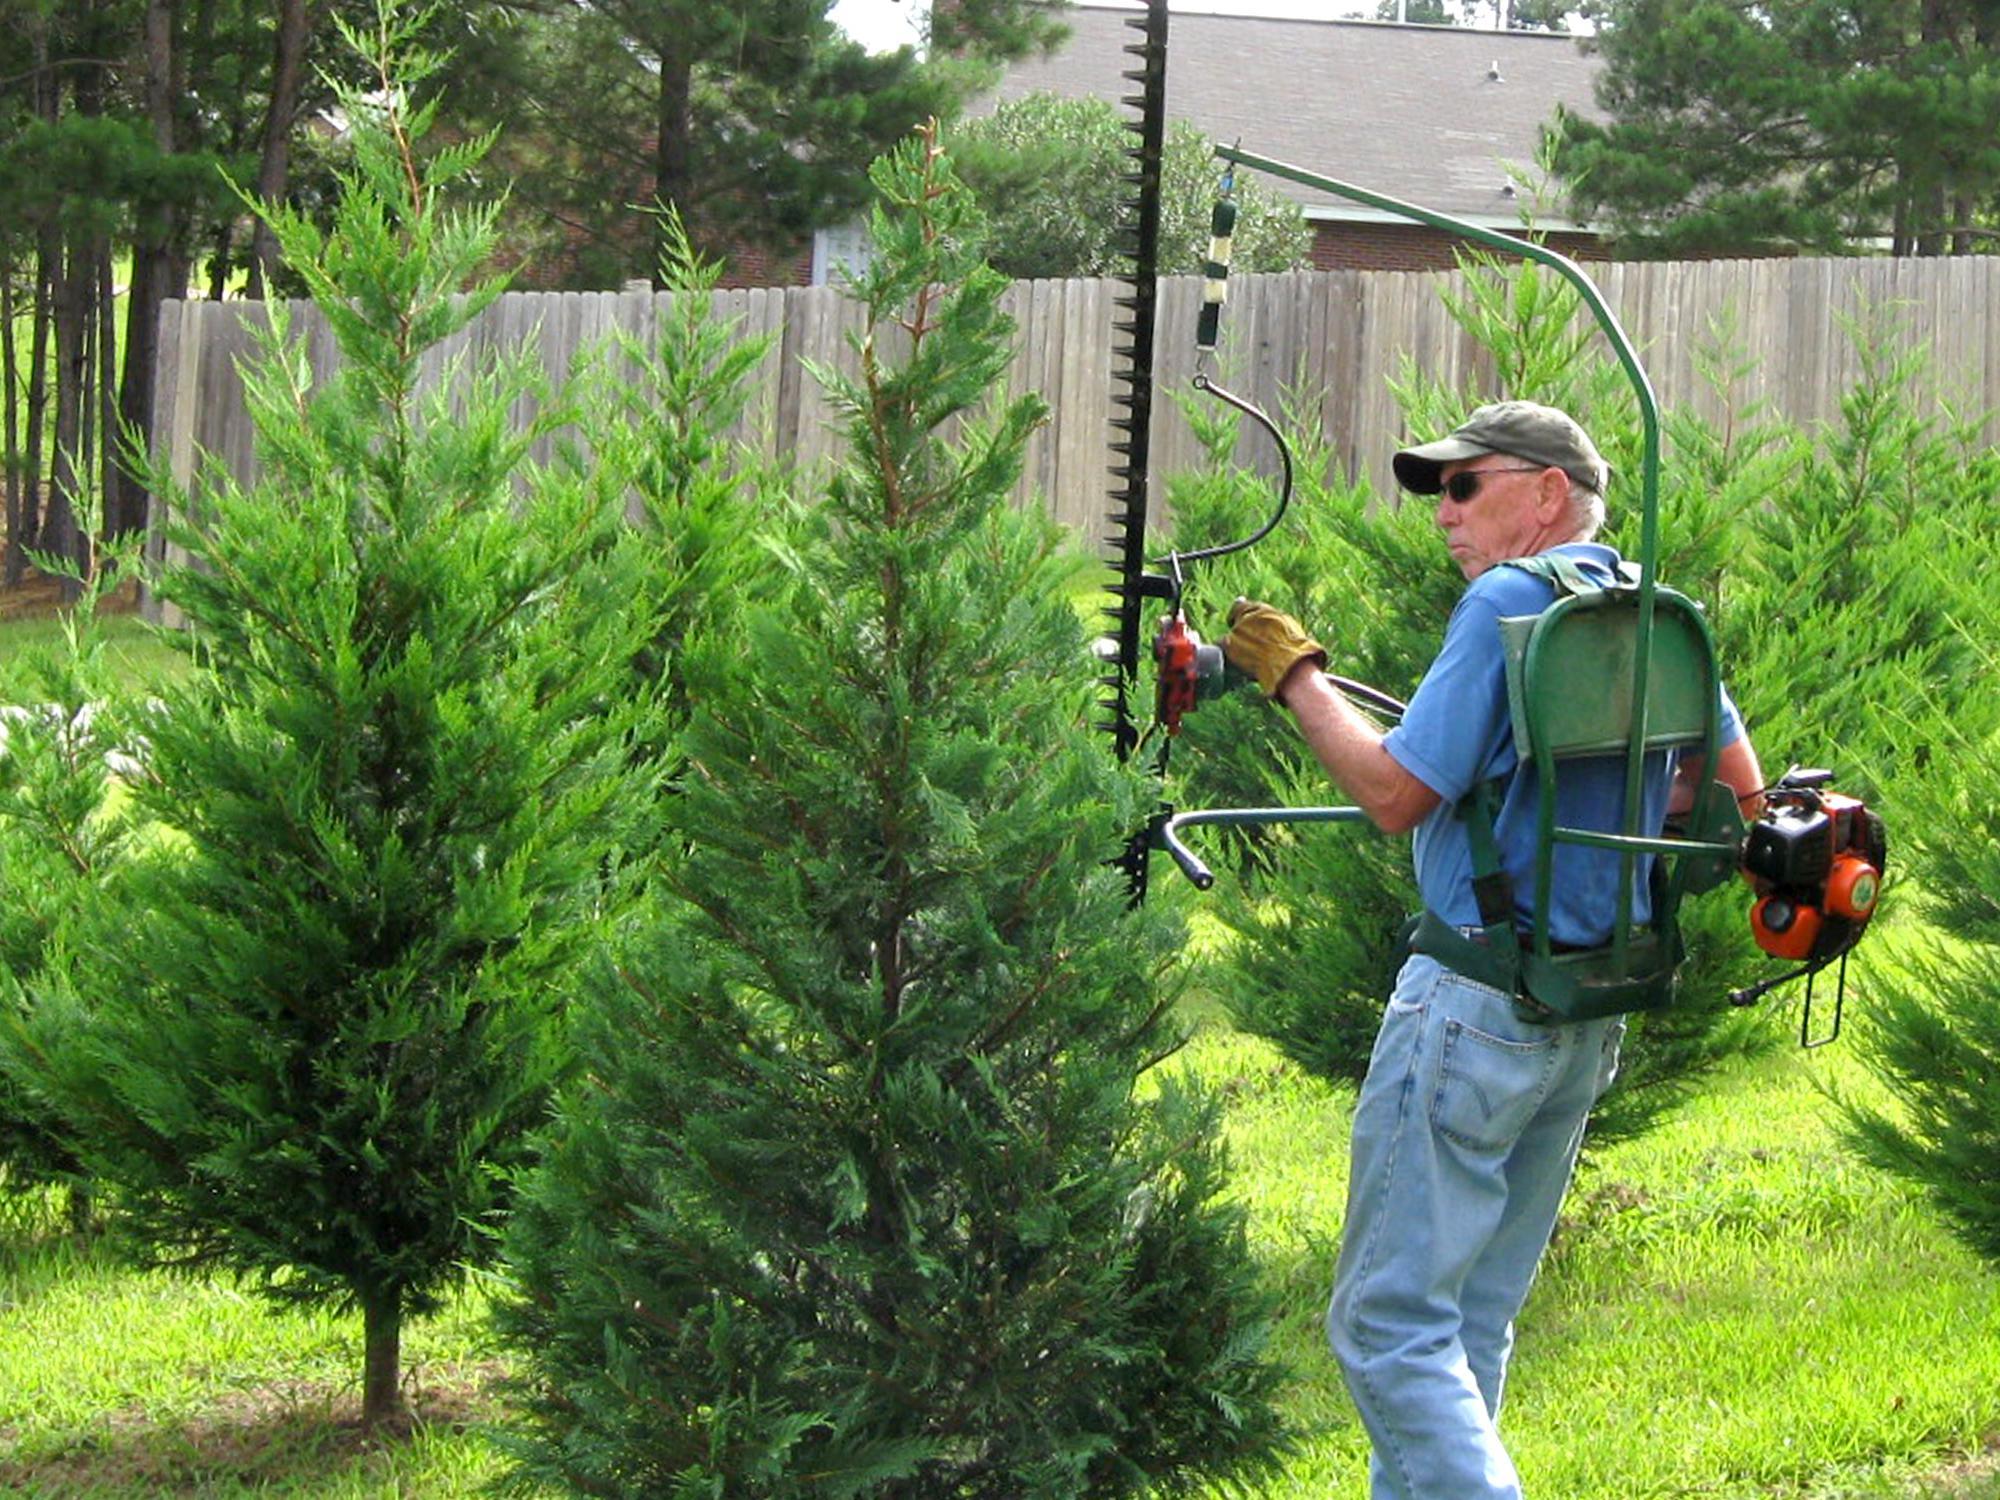 Marvelous Christmas Tree Producers Part - 8: Christmas Tree Farmer Bob Shearer, Of Purvis, Uses A Shearing Machine To  Trim Trees